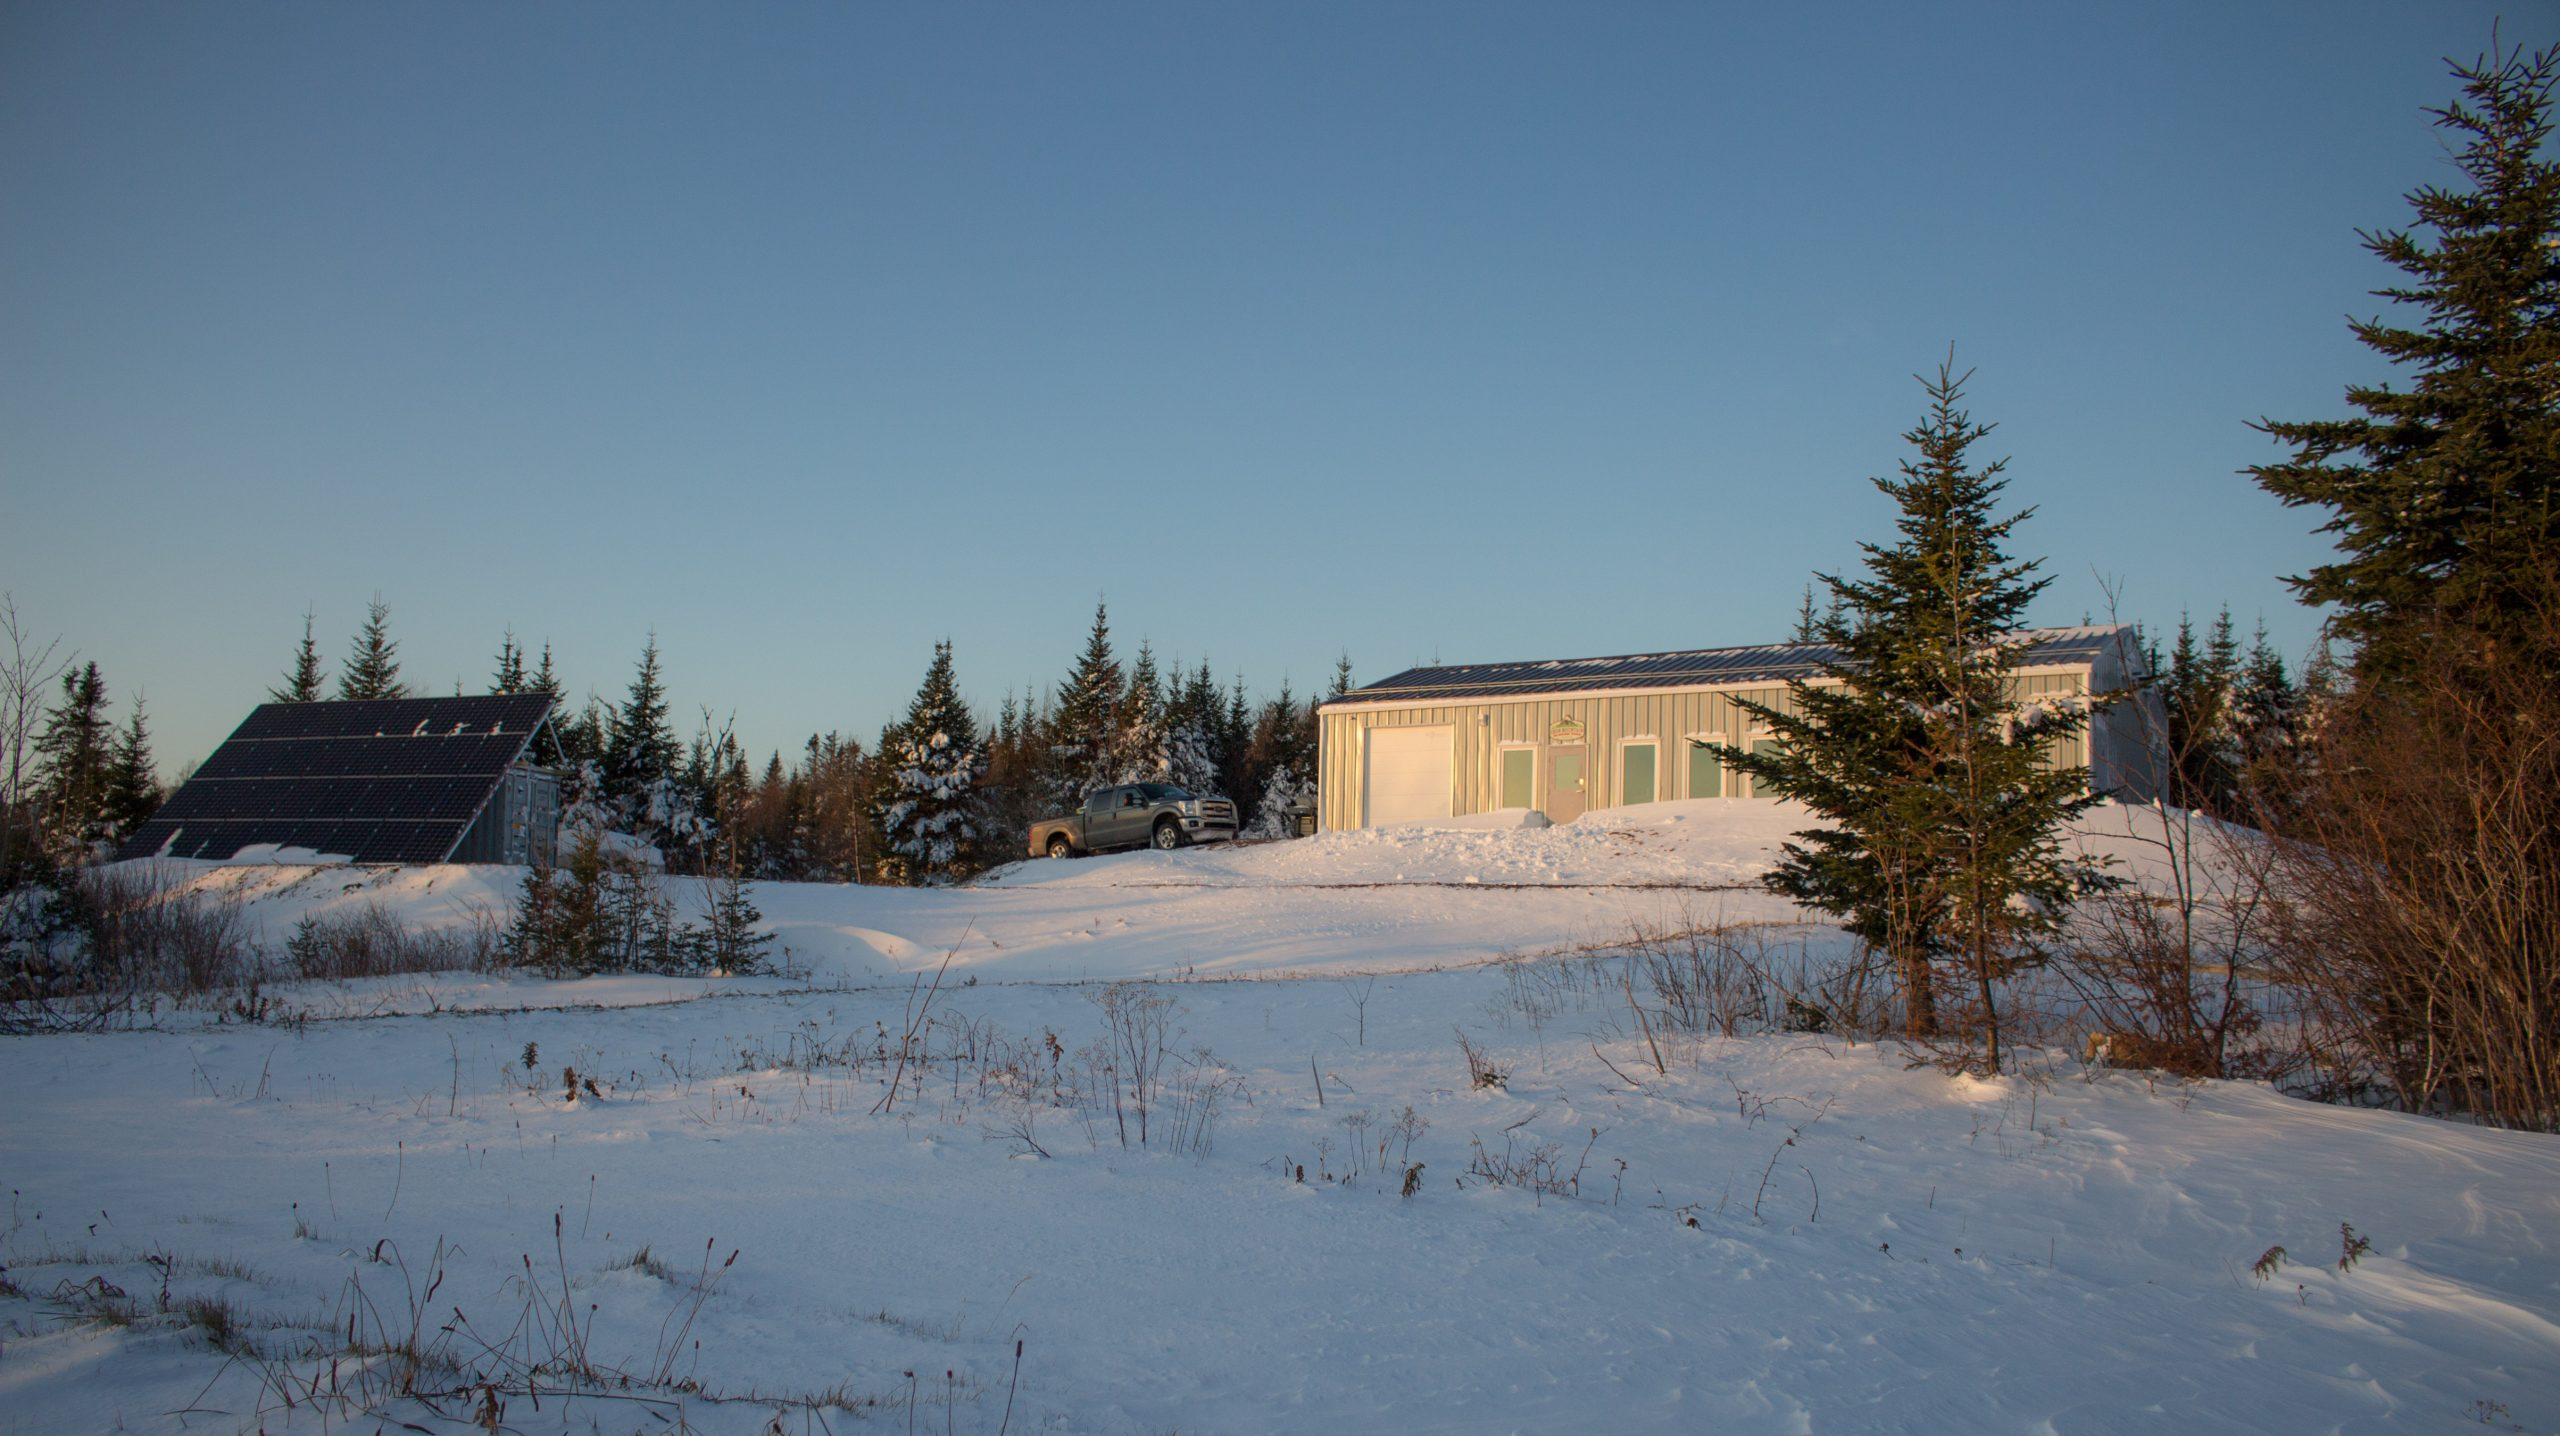 IronMountainCabins - Winter Cape Breton Island Nova Scotia (1 of 1)-13